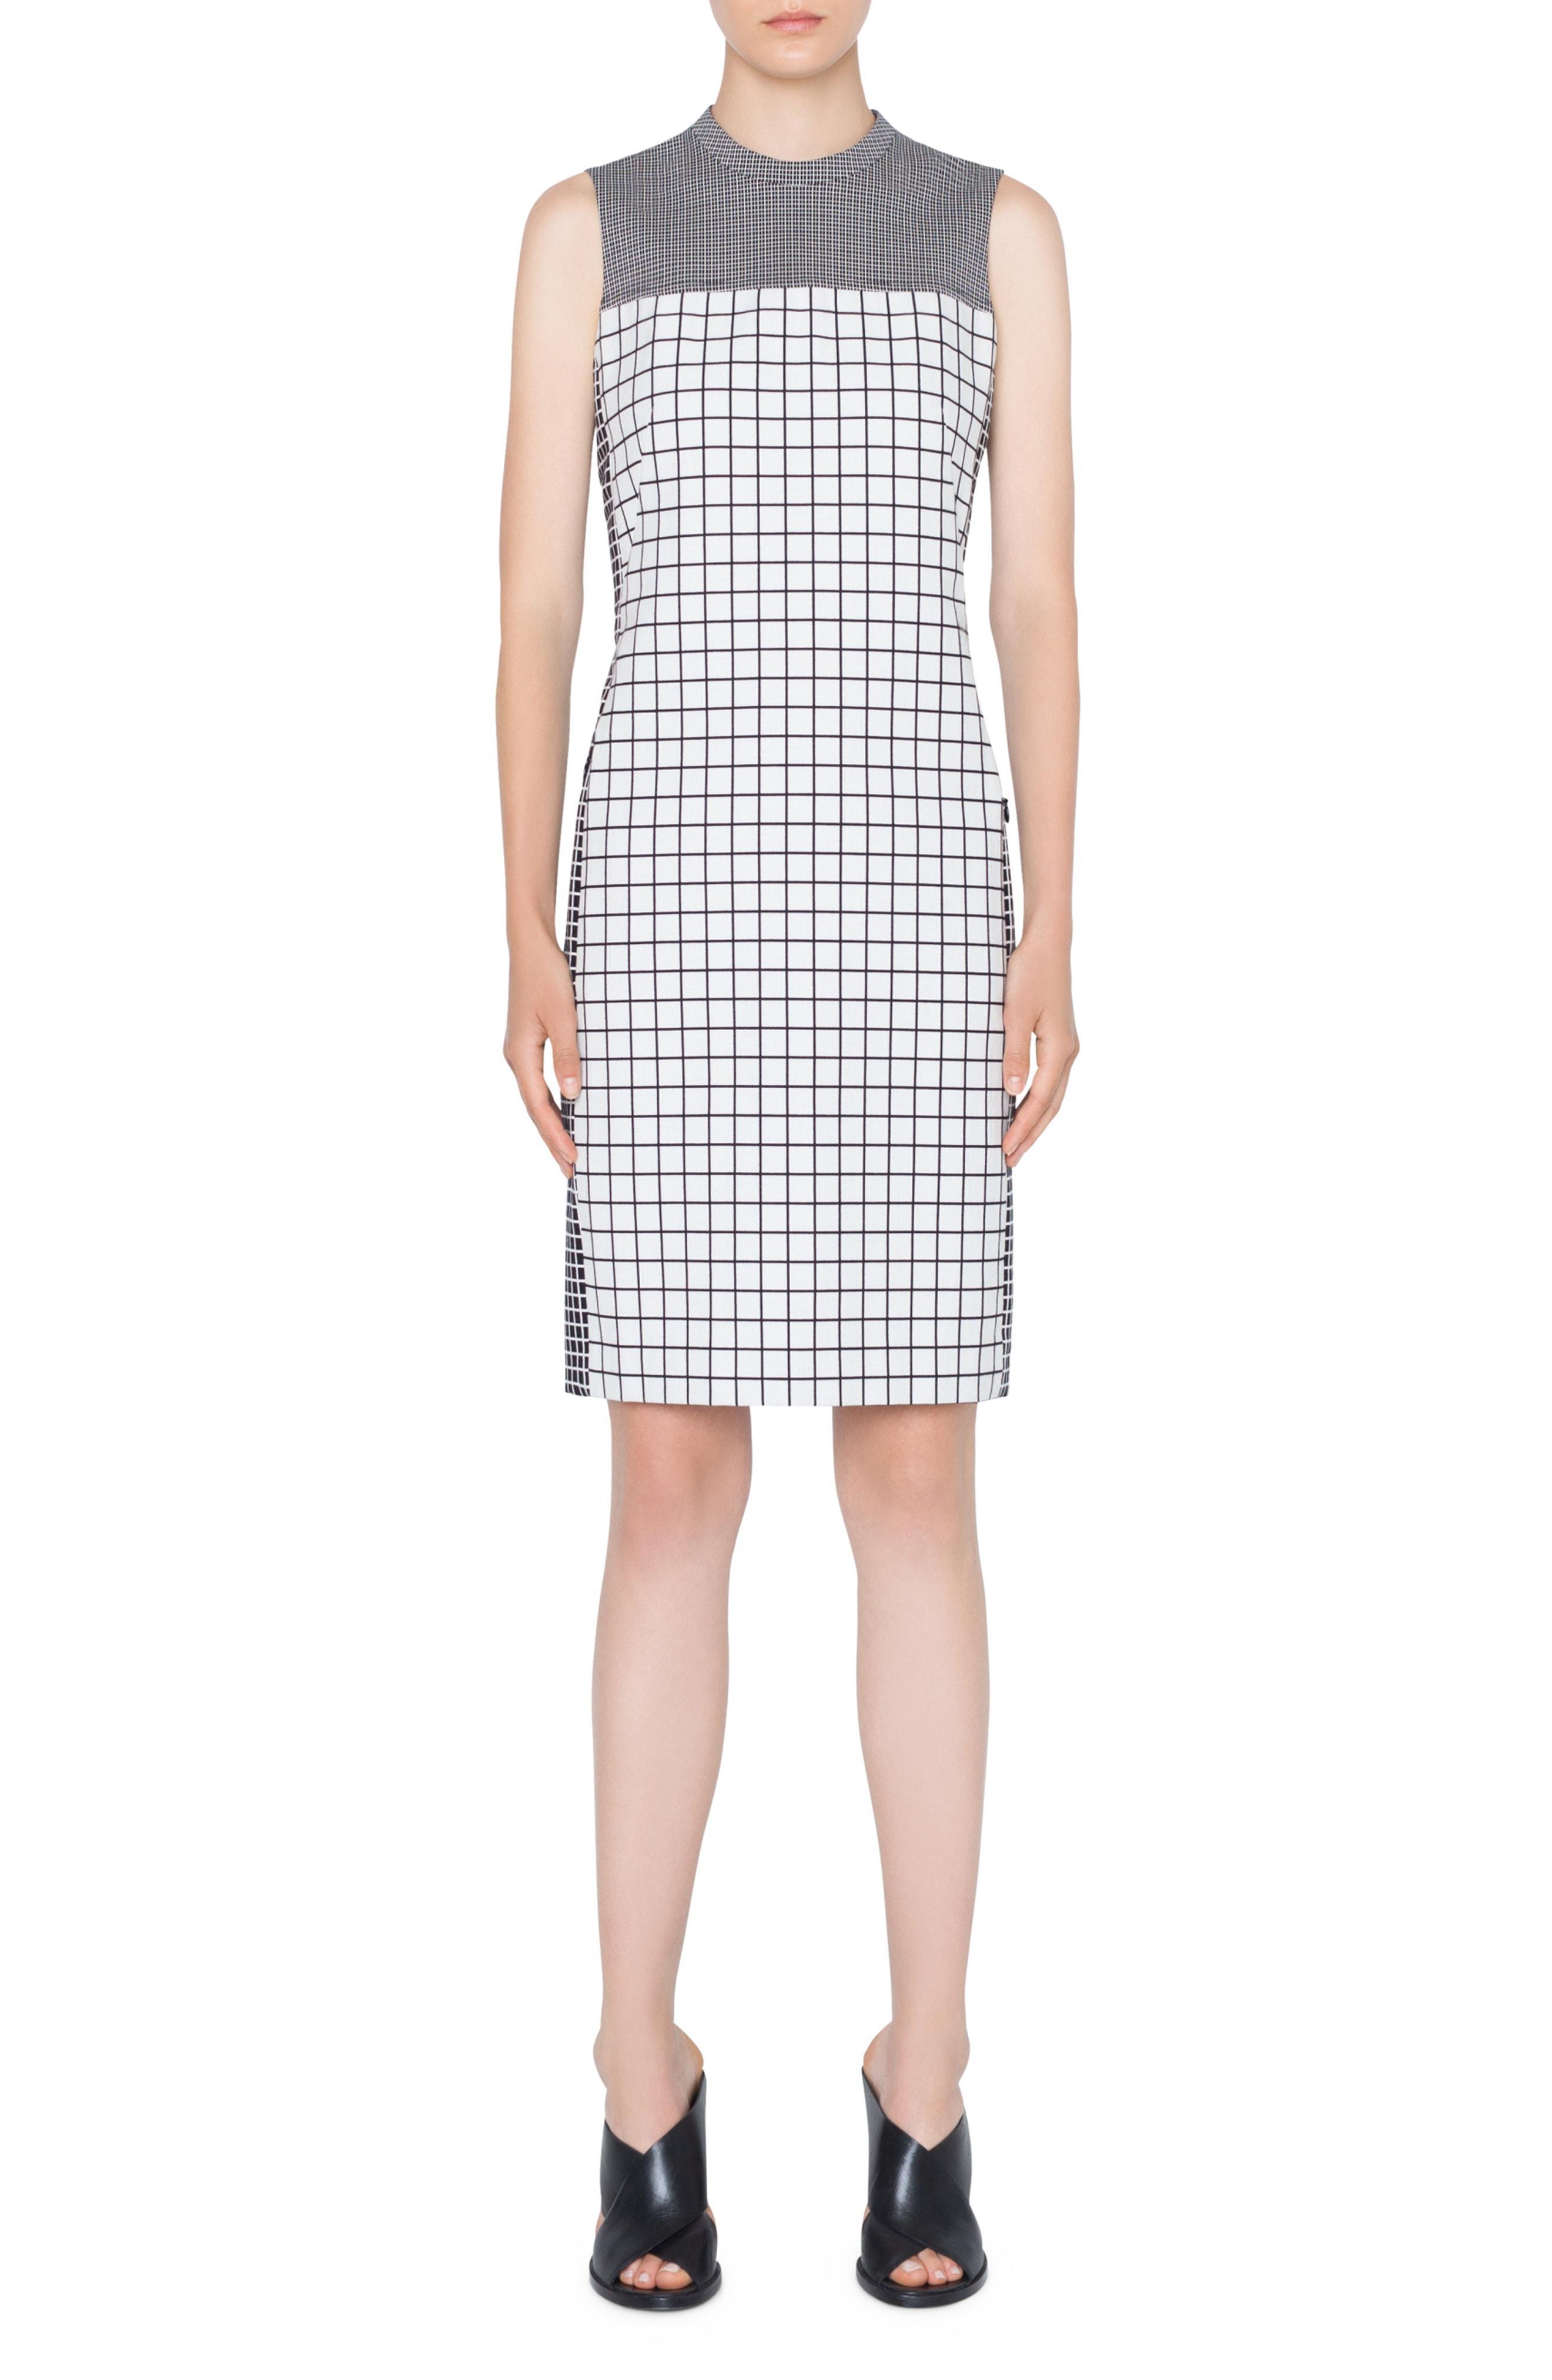 7a68873a0a Lyst - Akris Punto Grid Sheath Dress in White